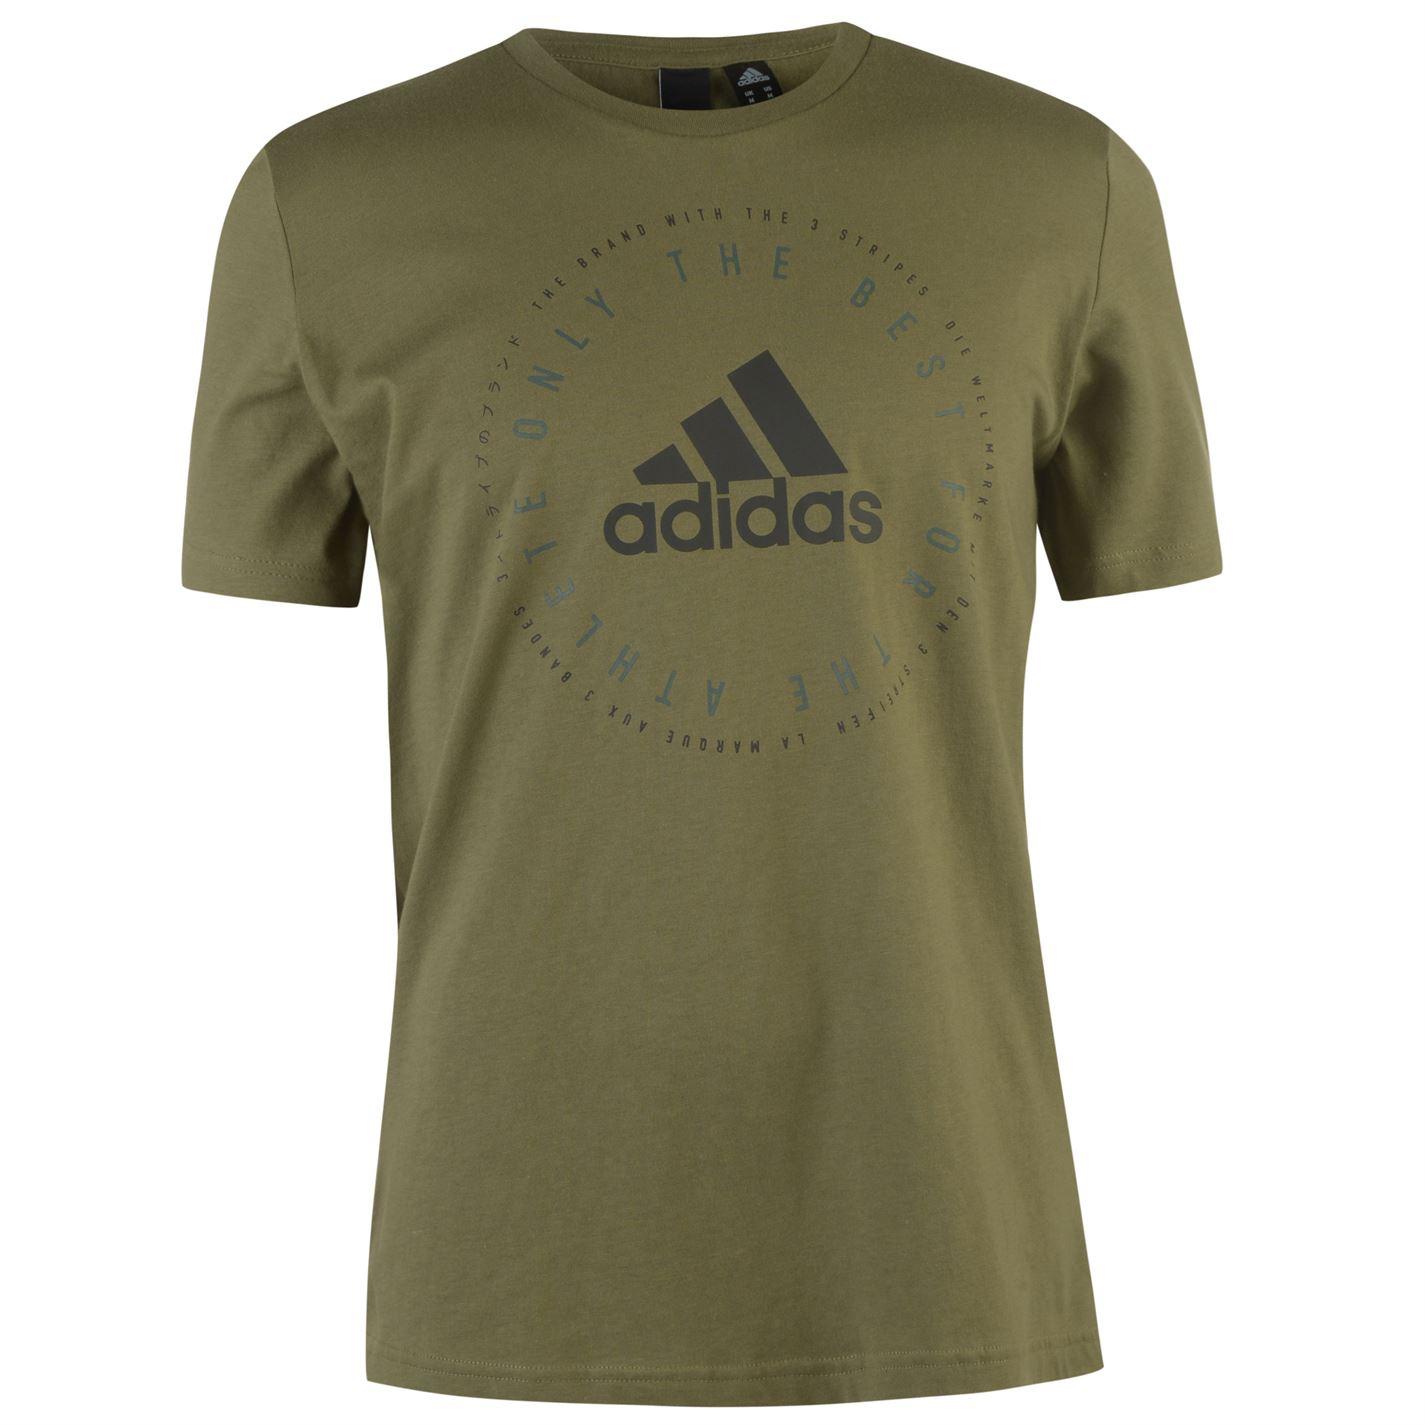 Adidas Emblem T Shirt Mens